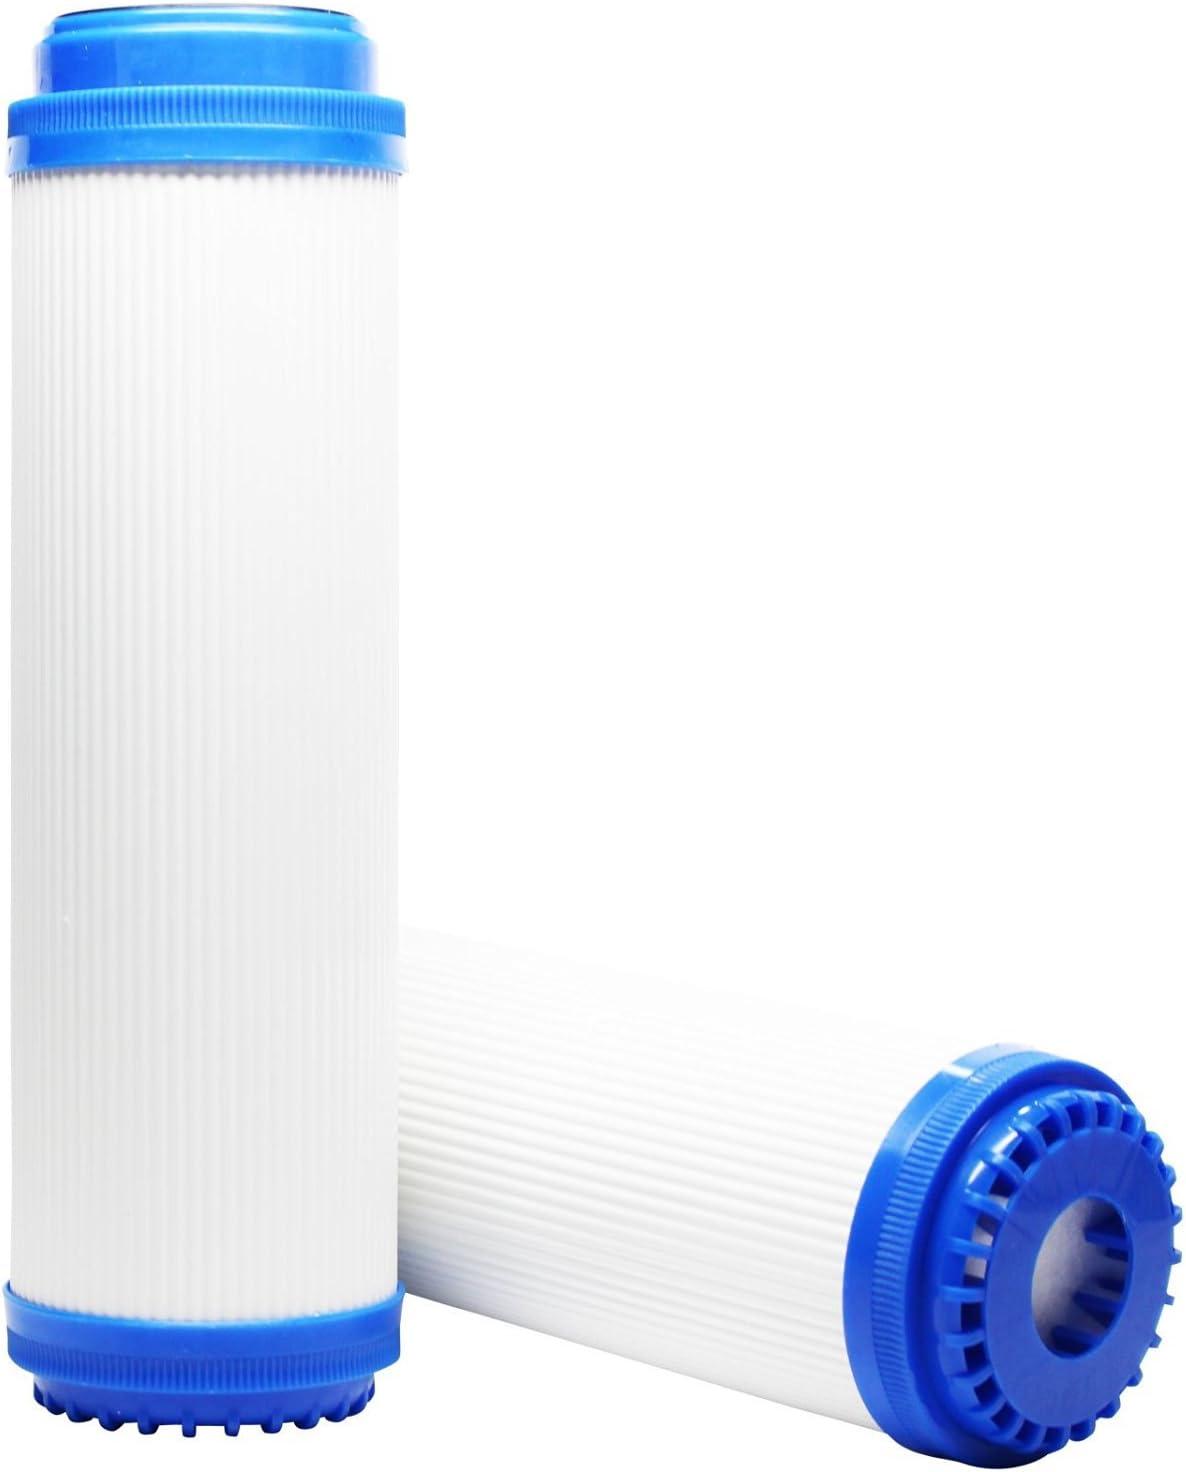 CFS CFS-161 10-Inch GAC Filter